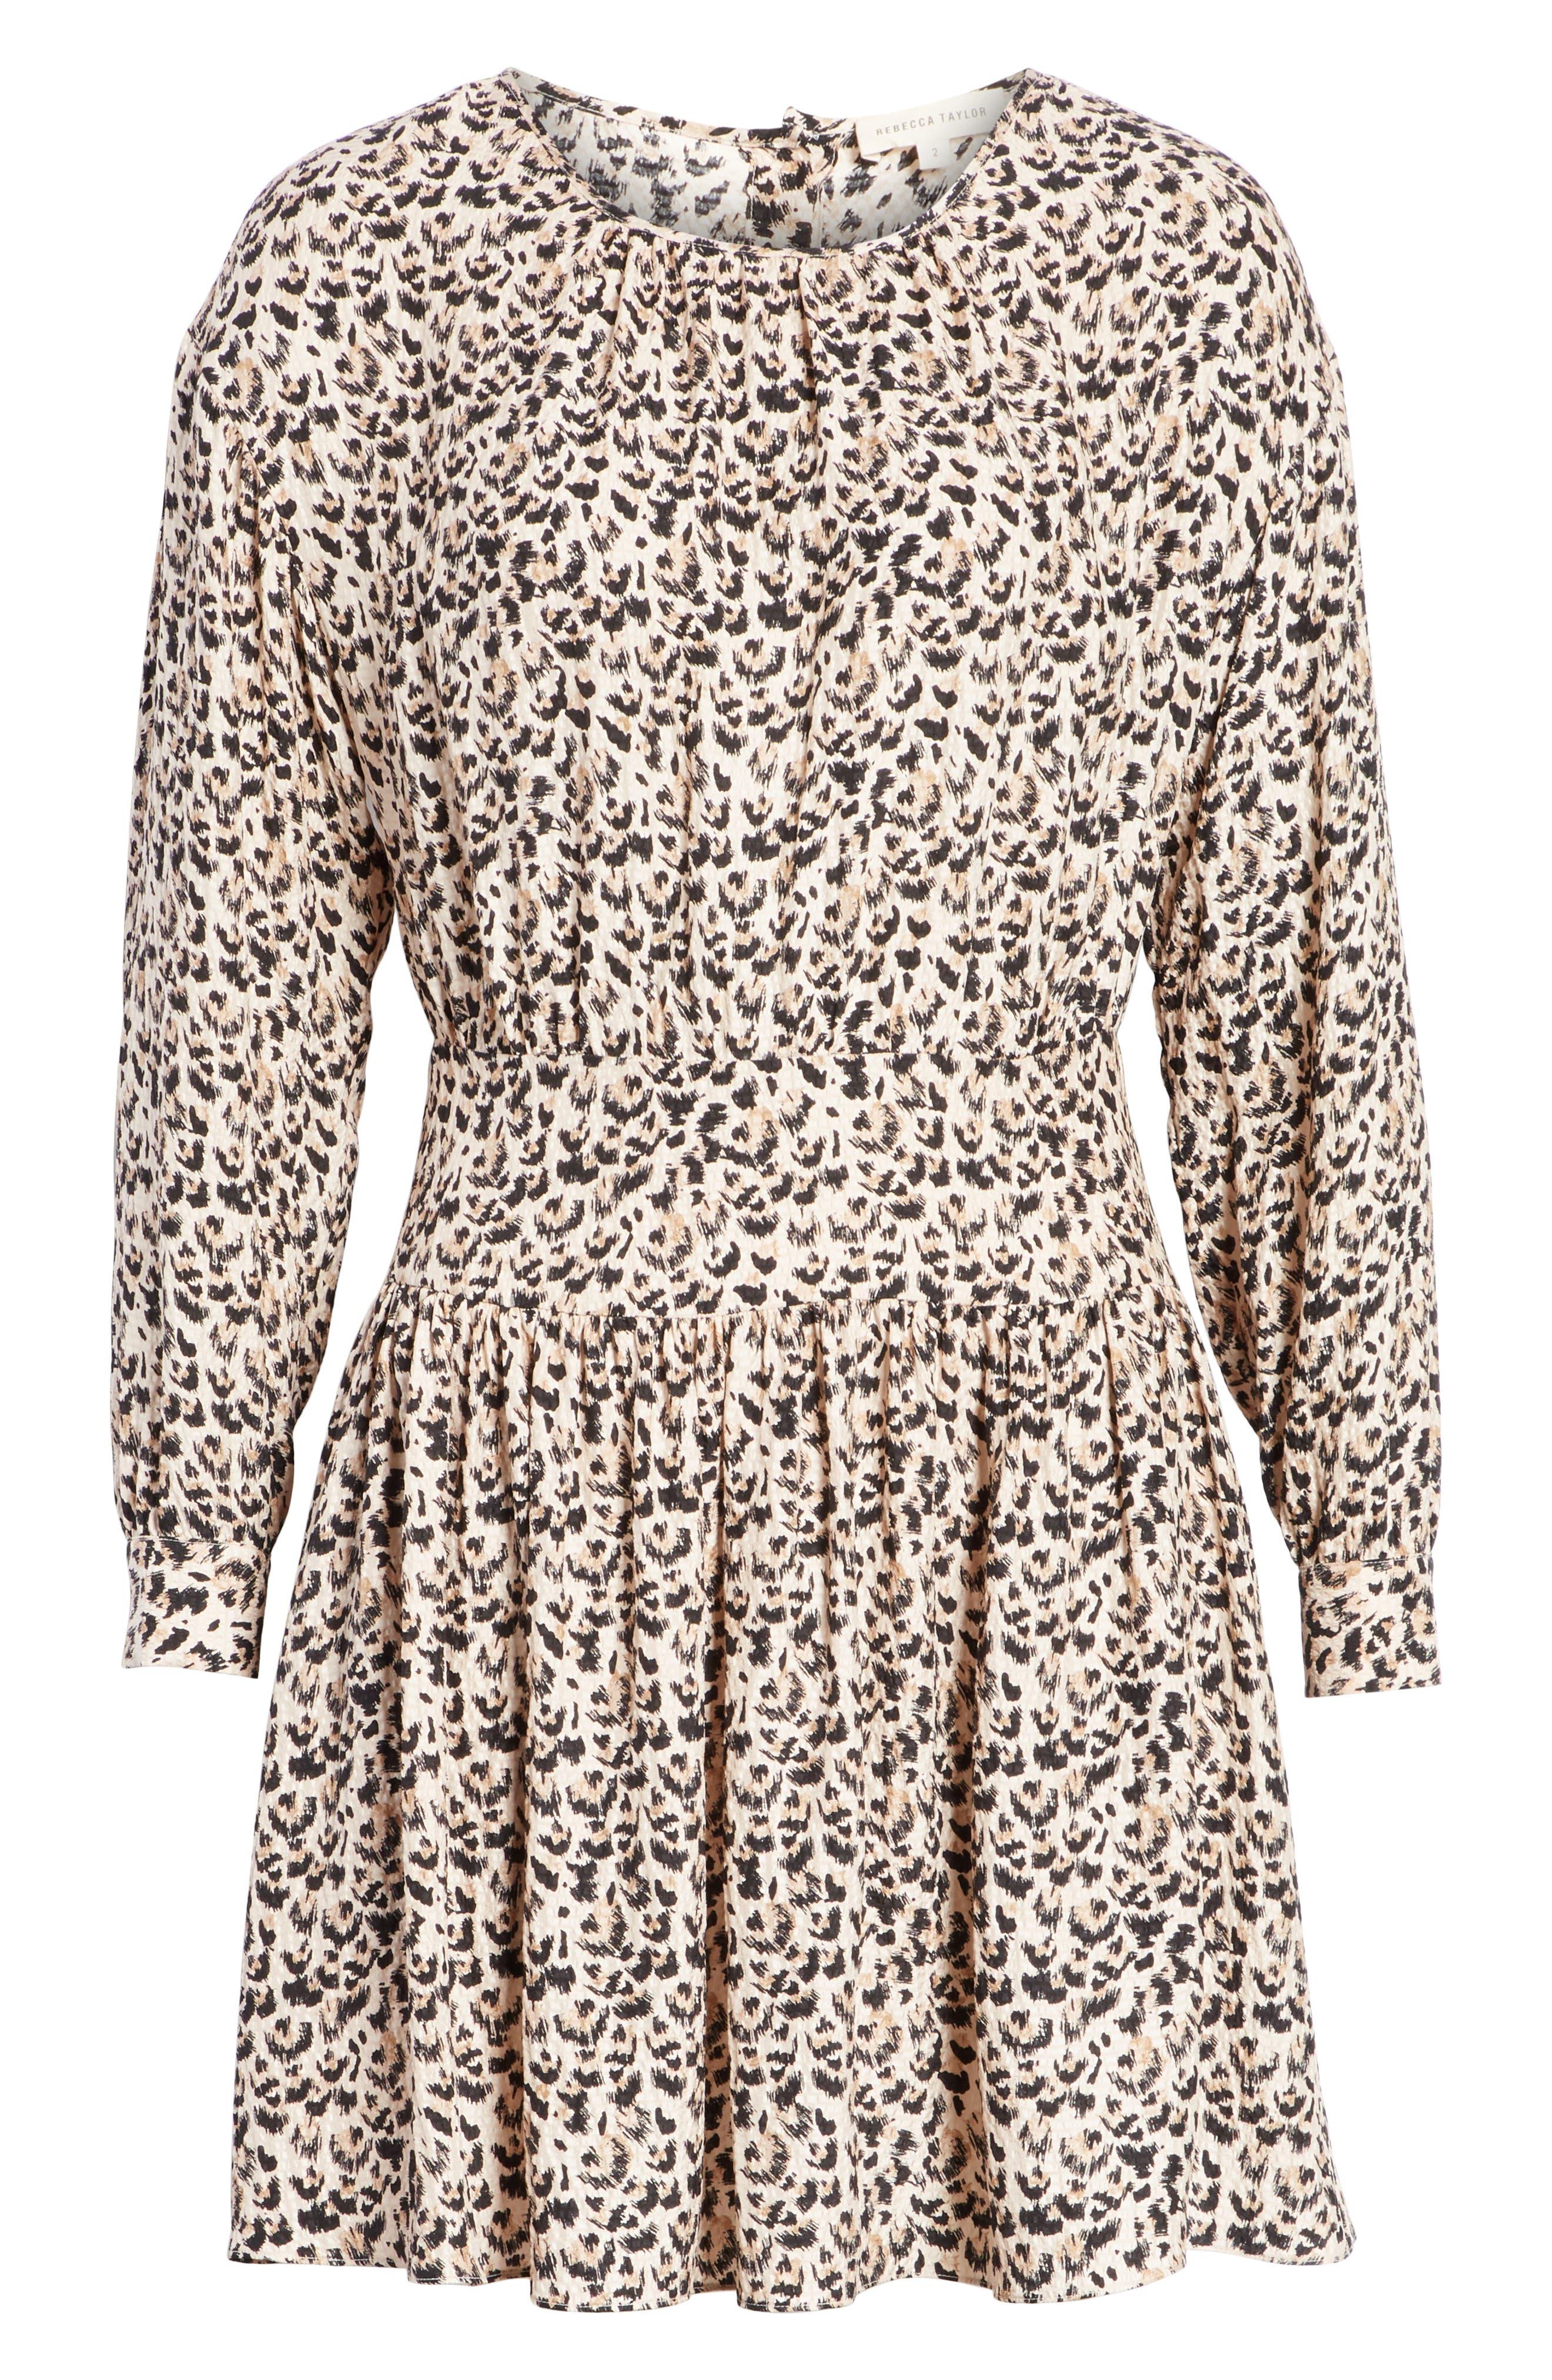 Leopard Print Silk Dress,                             Alternate thumbnail 7, color,                             CARAMEL COMBO